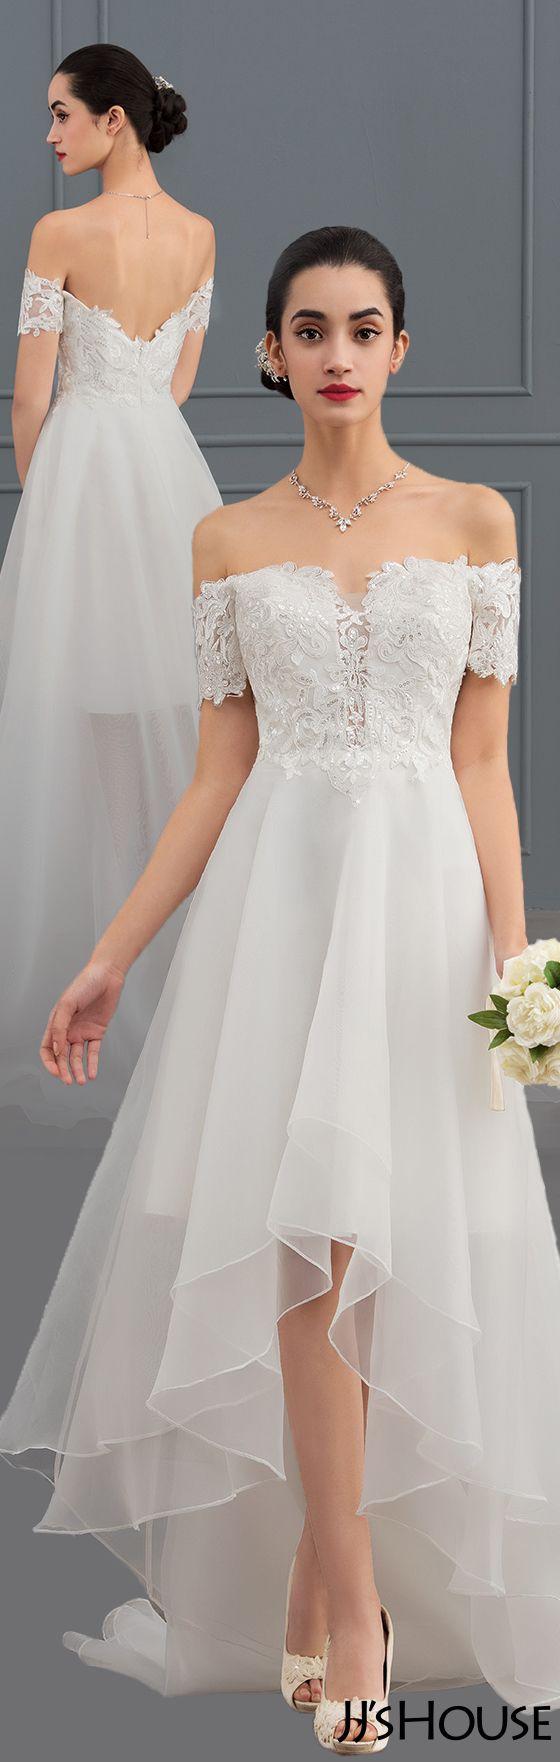 Amazing A-Line/Princess Off-the-Shoulder Asymmetrical Wedding Dress #JJsHouse#Wedding